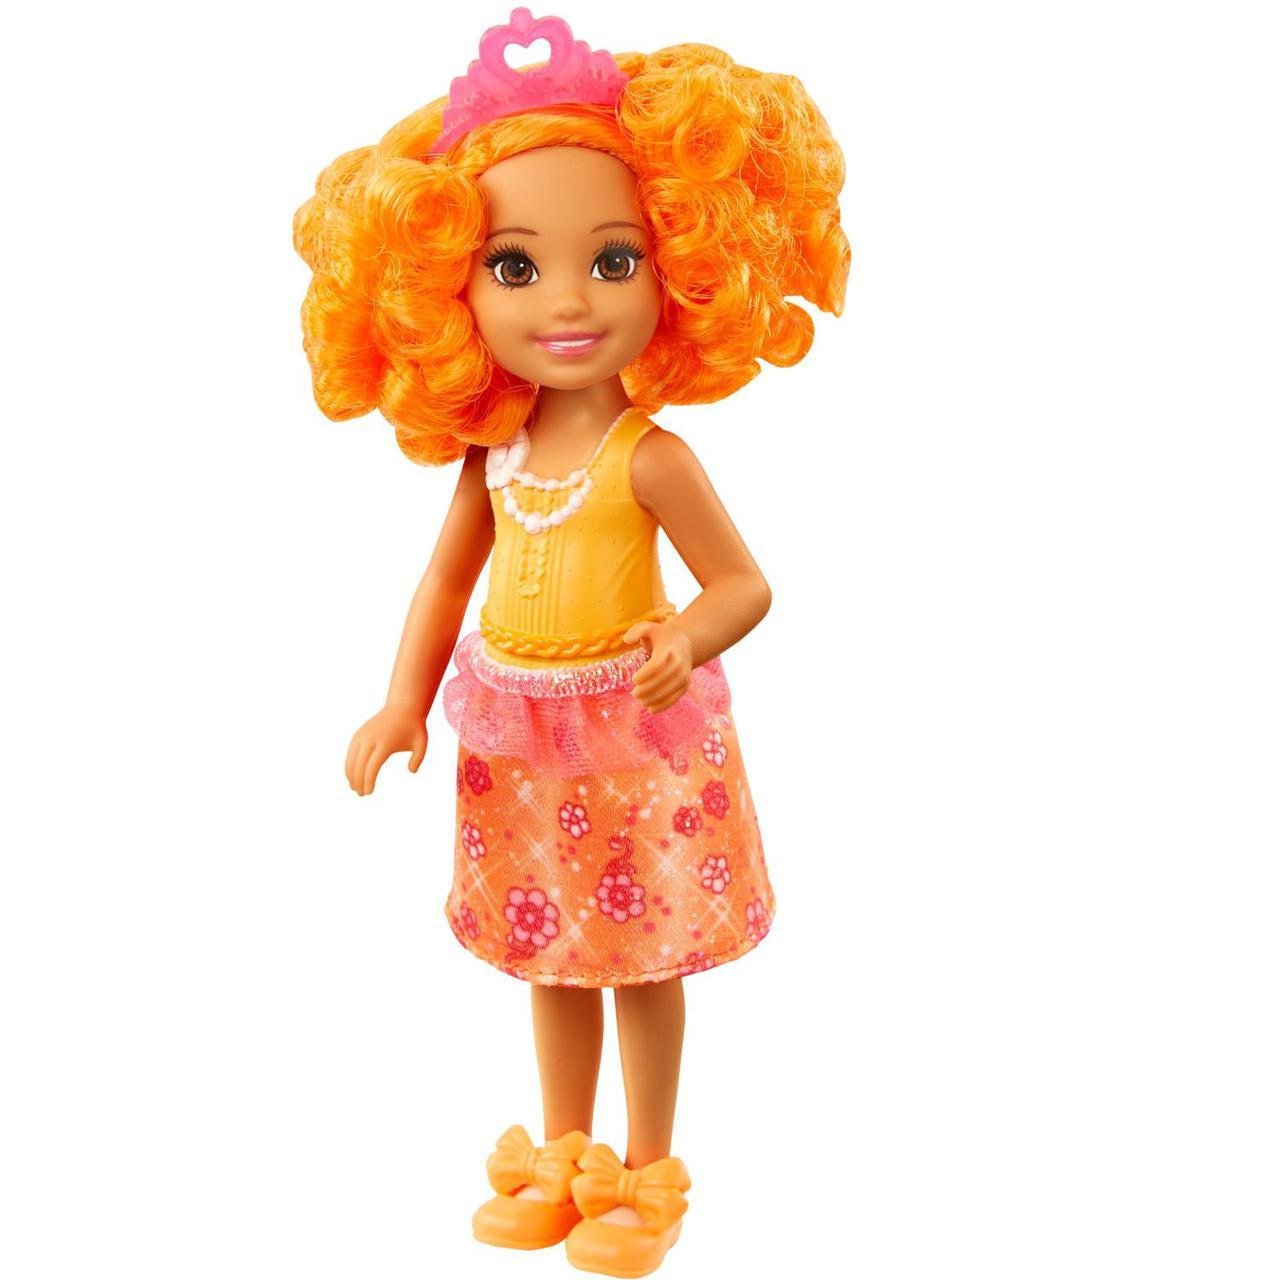 "Barbie ""Дримтопиа"" Кукла Барби Малышка, Оранжевая"